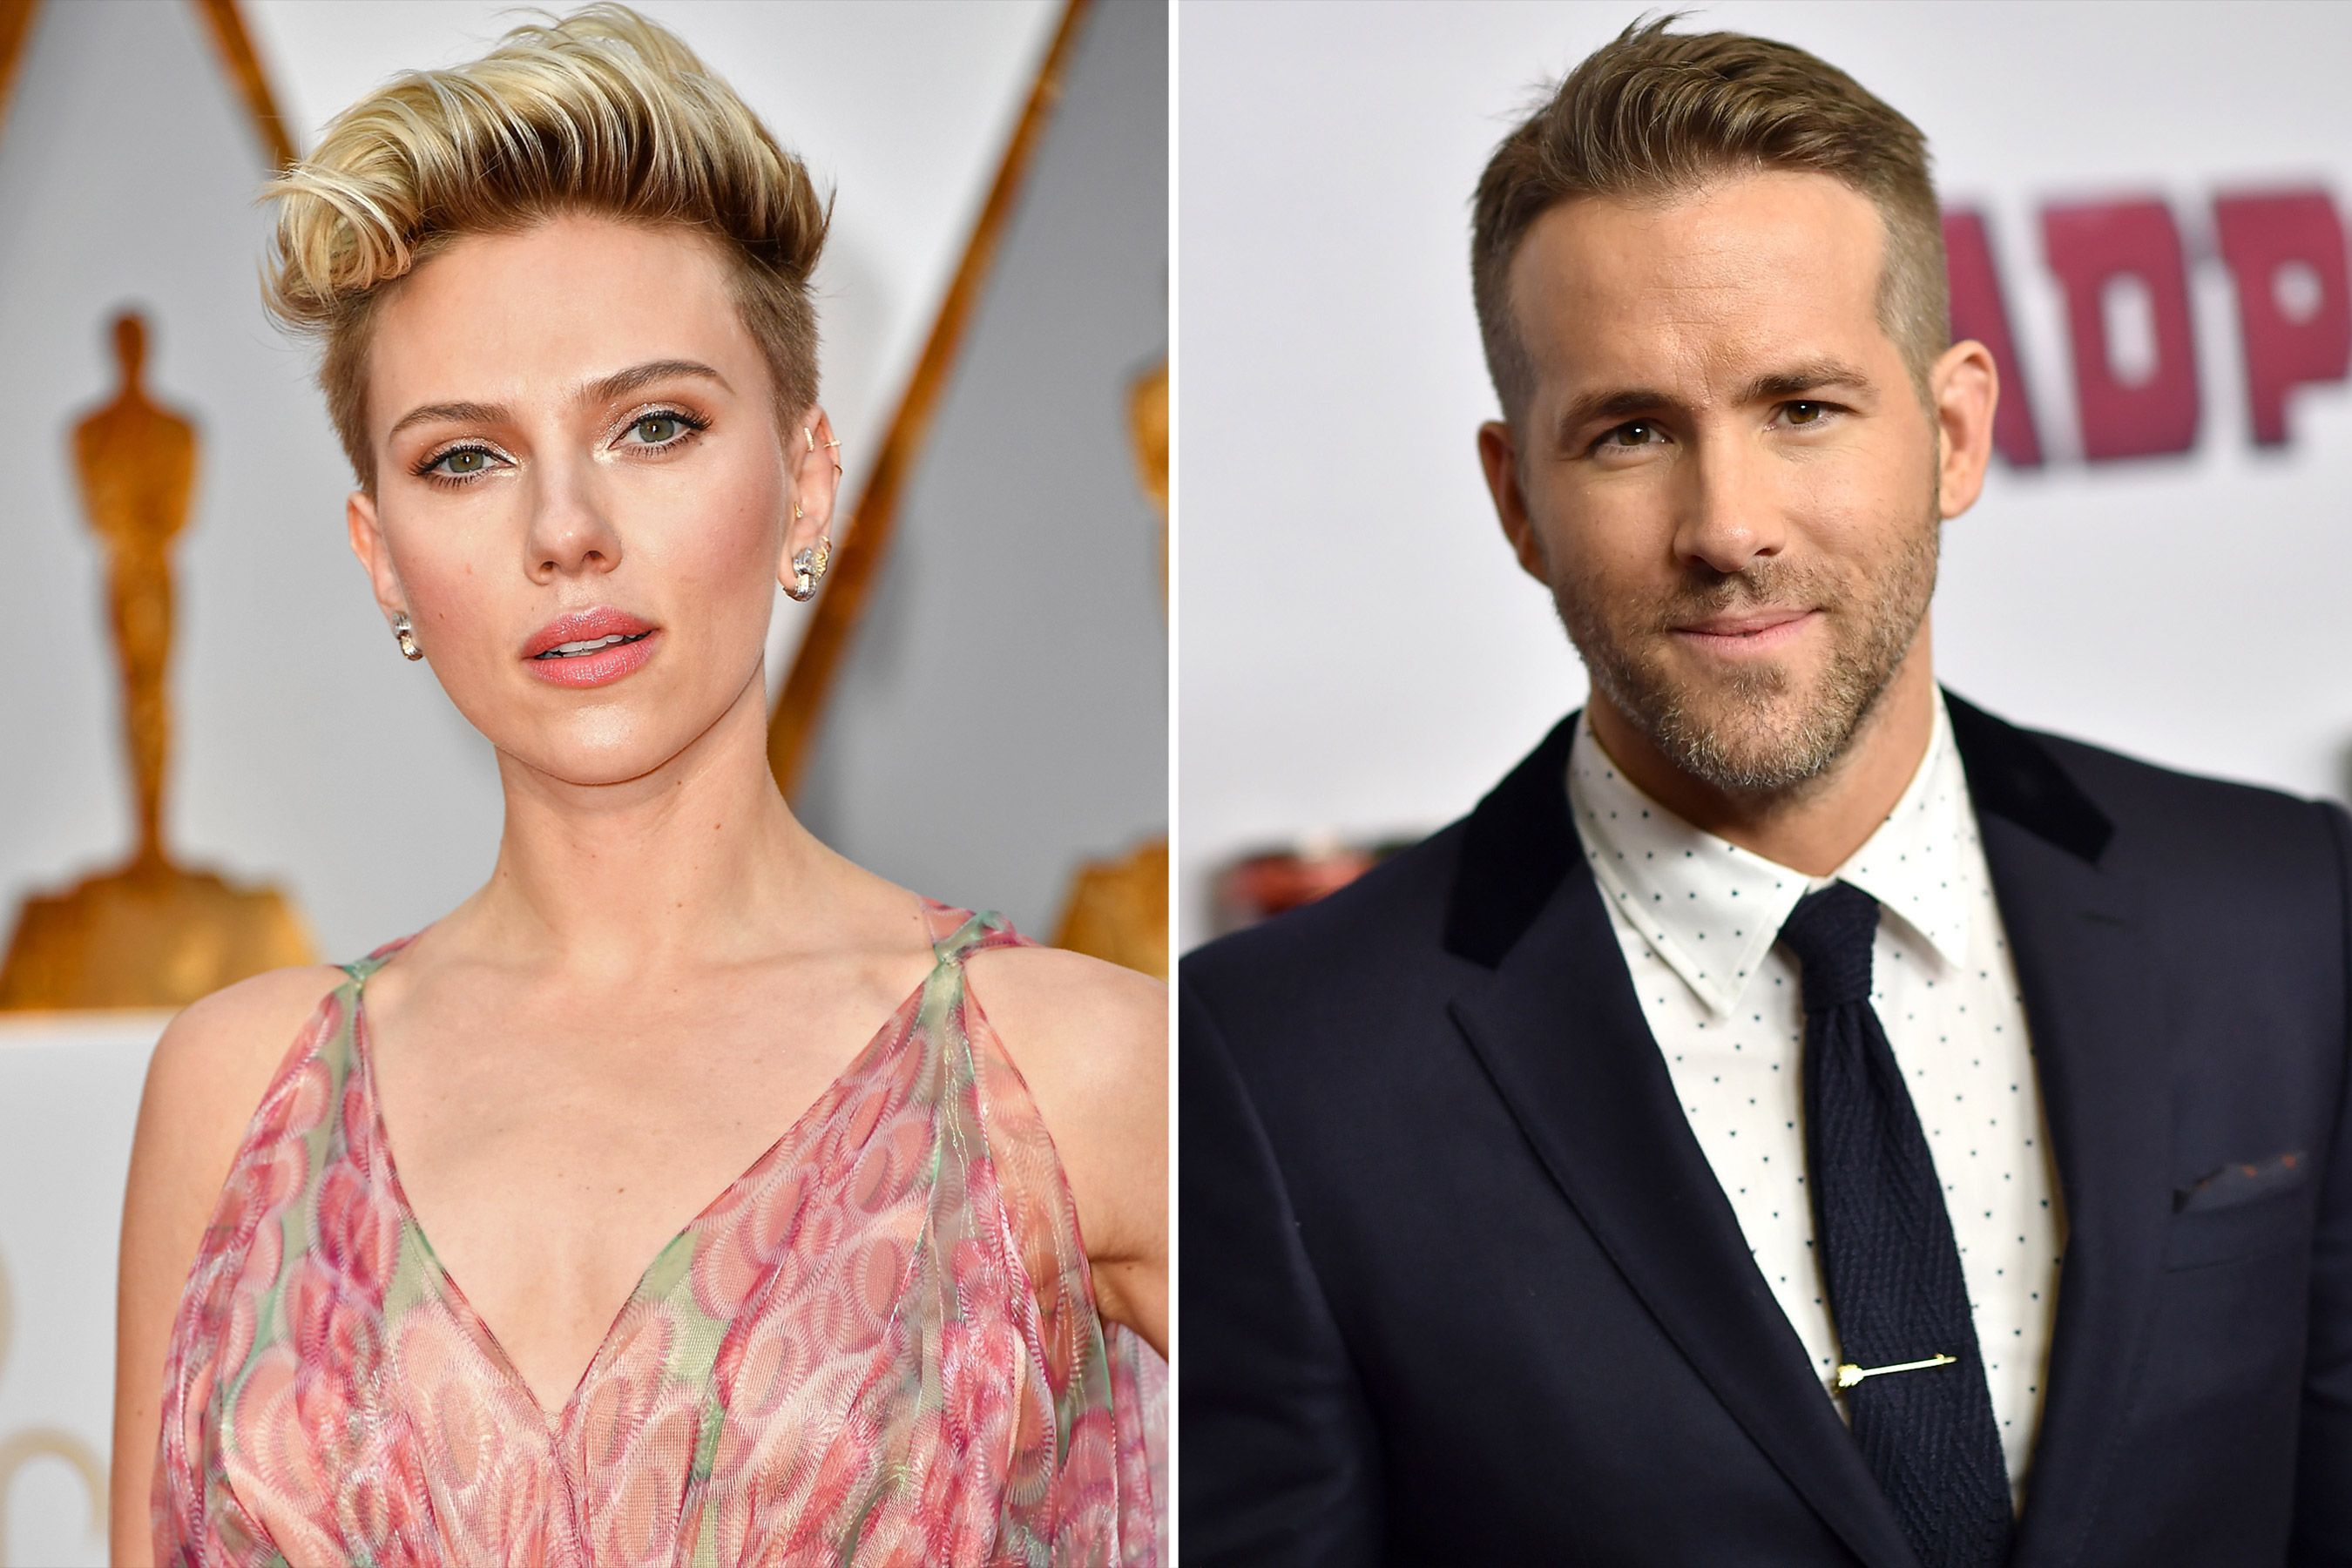 Scarlett Johansson Admits She 'Romanticized' Marriage